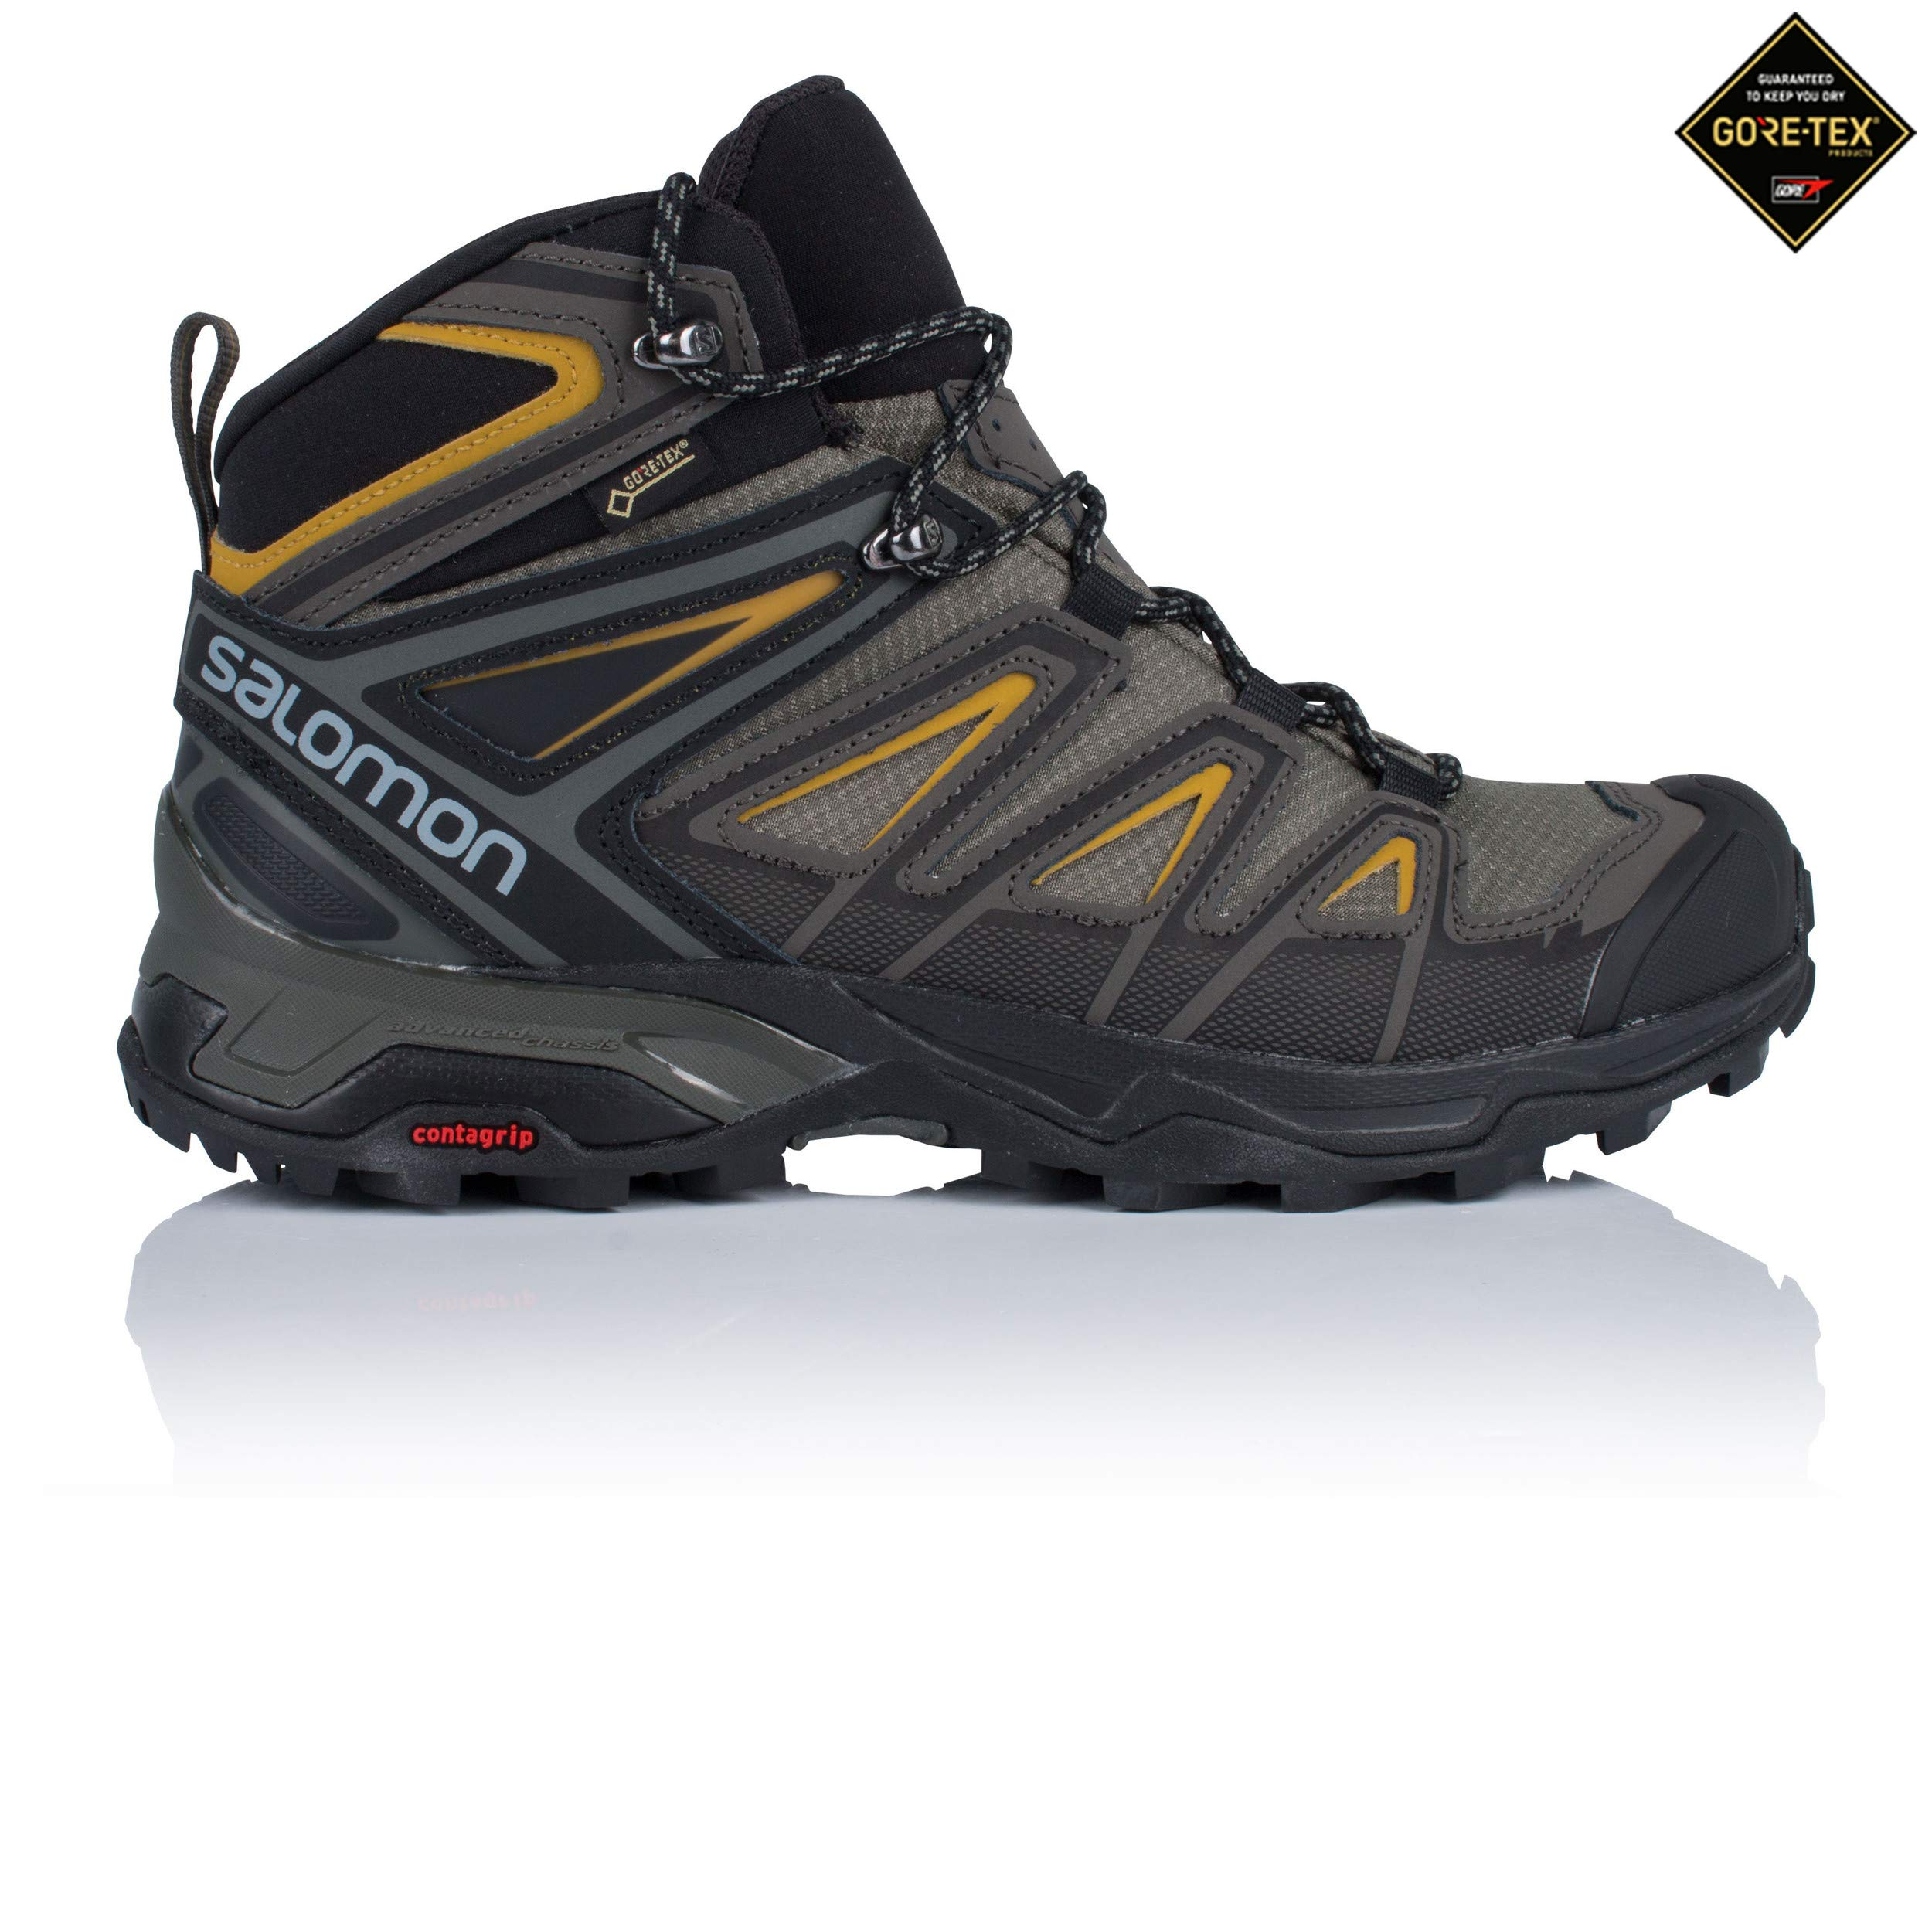 Salomon Men's X Ultra 3 Mid GTX Waterproof Hiking Boots, Castor Gray/Black/Green Sulpher, 14D (Medium)